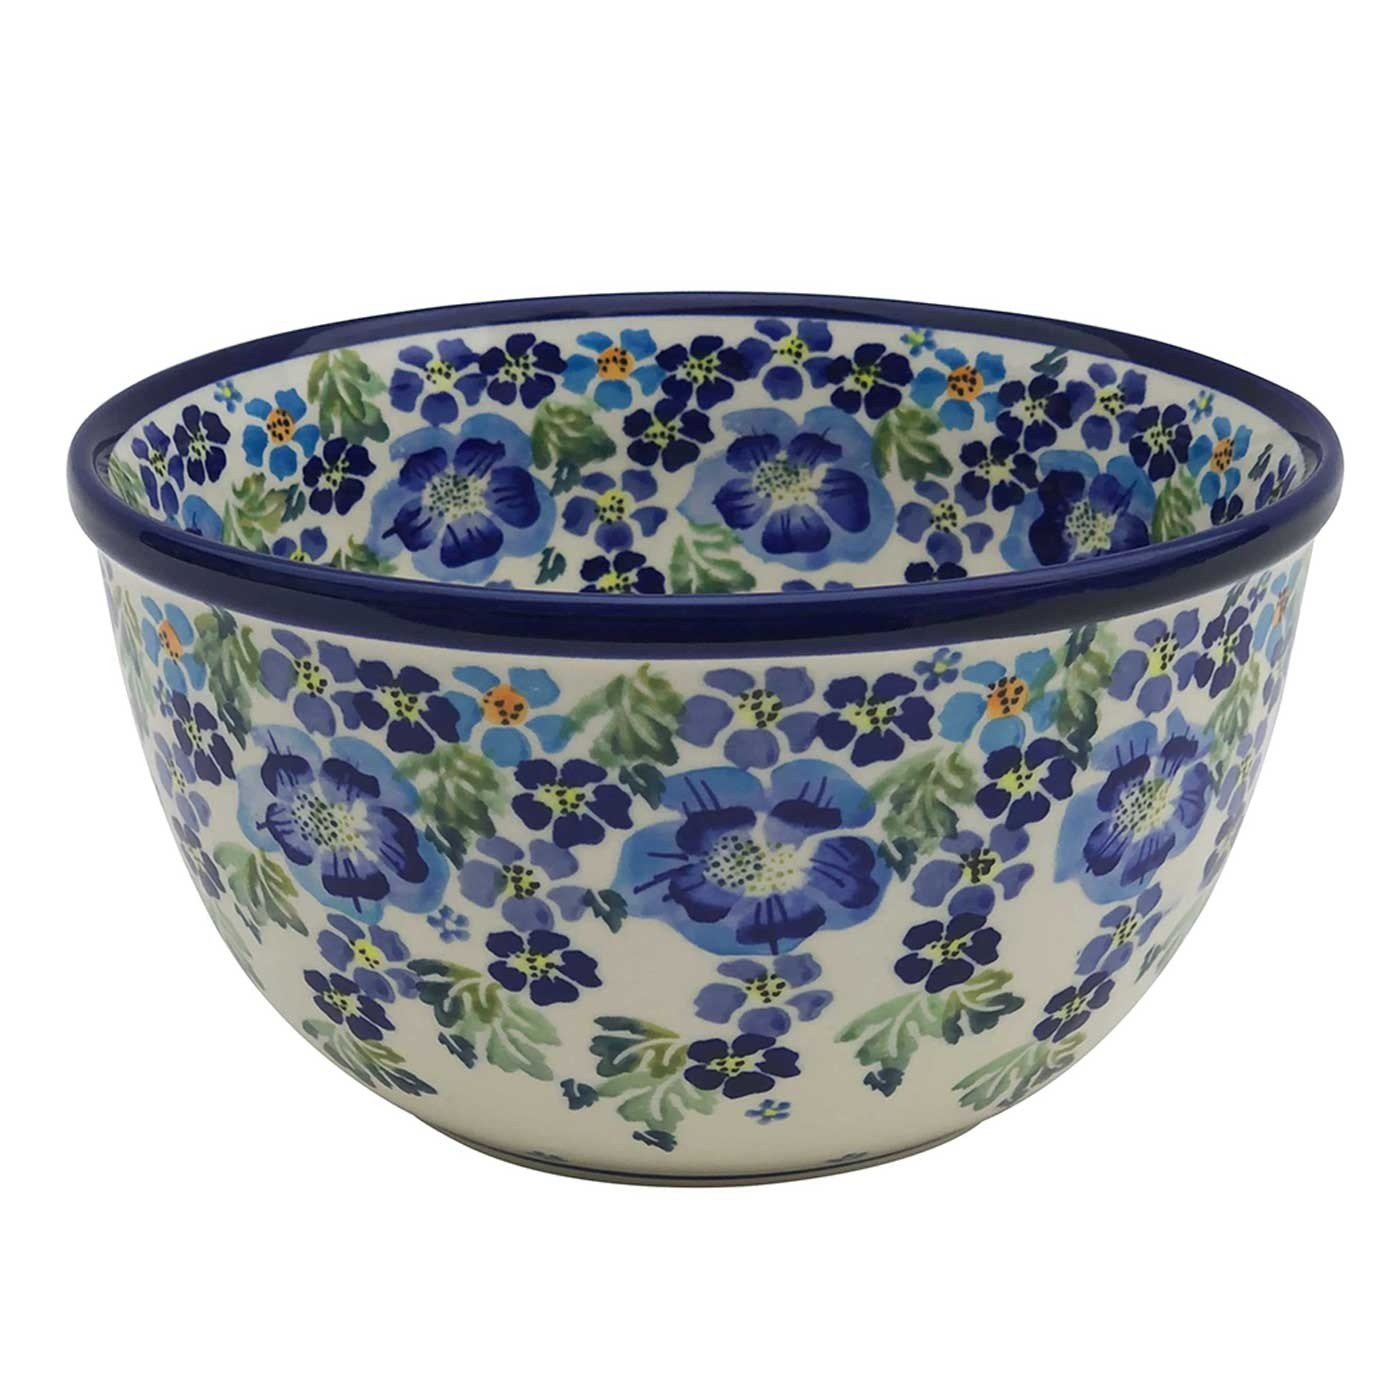 "Pottery Avenue True Blues 8"" Stoneware Mixing Bowl (MD)"